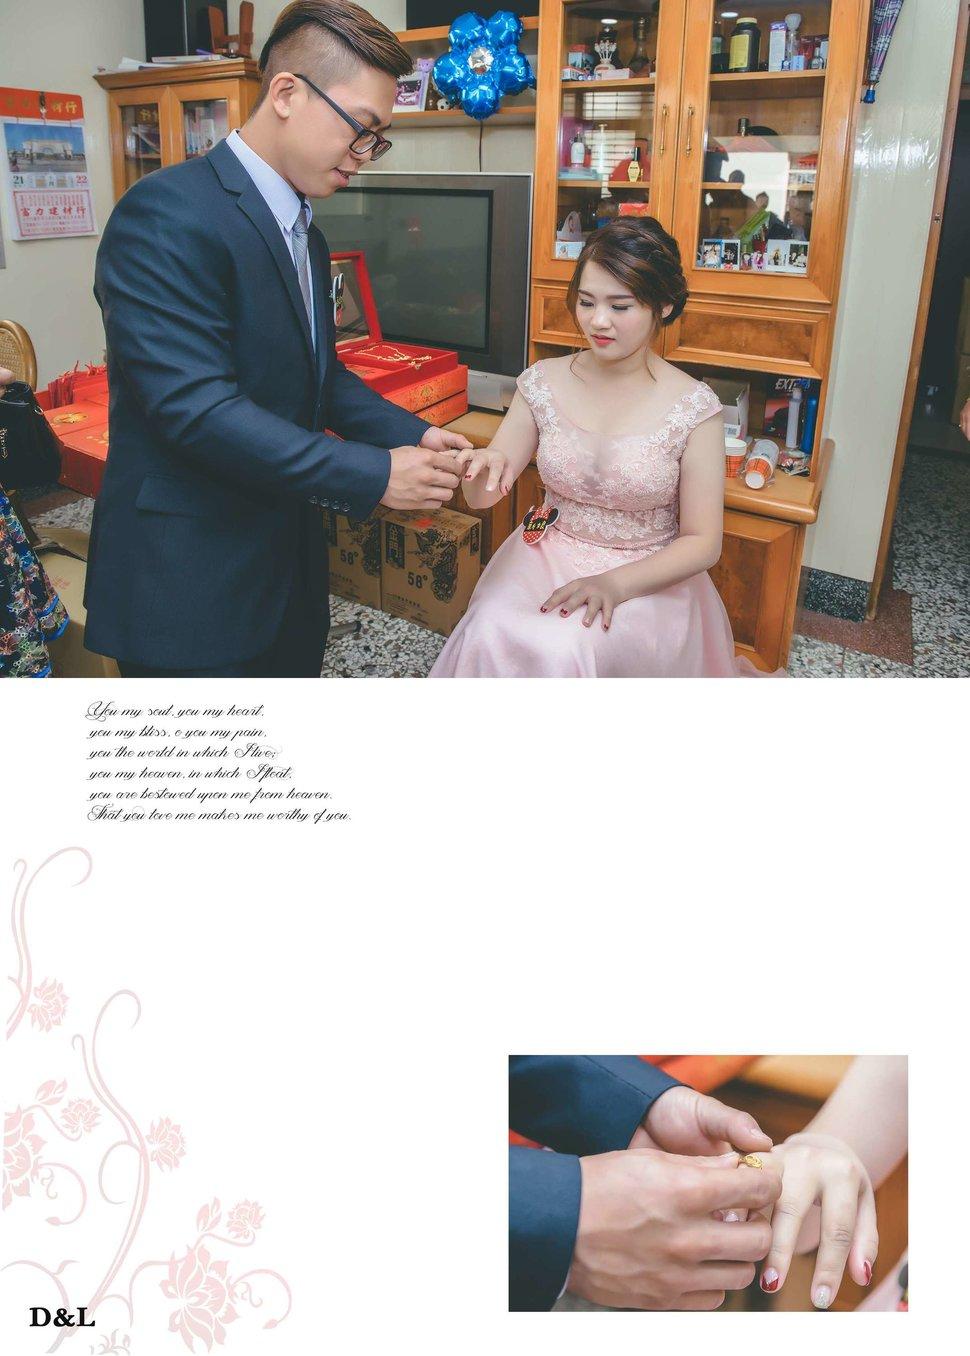 10 - D&L 婚禮事務 · 婚禮婚紗攝影 - 結婚吧